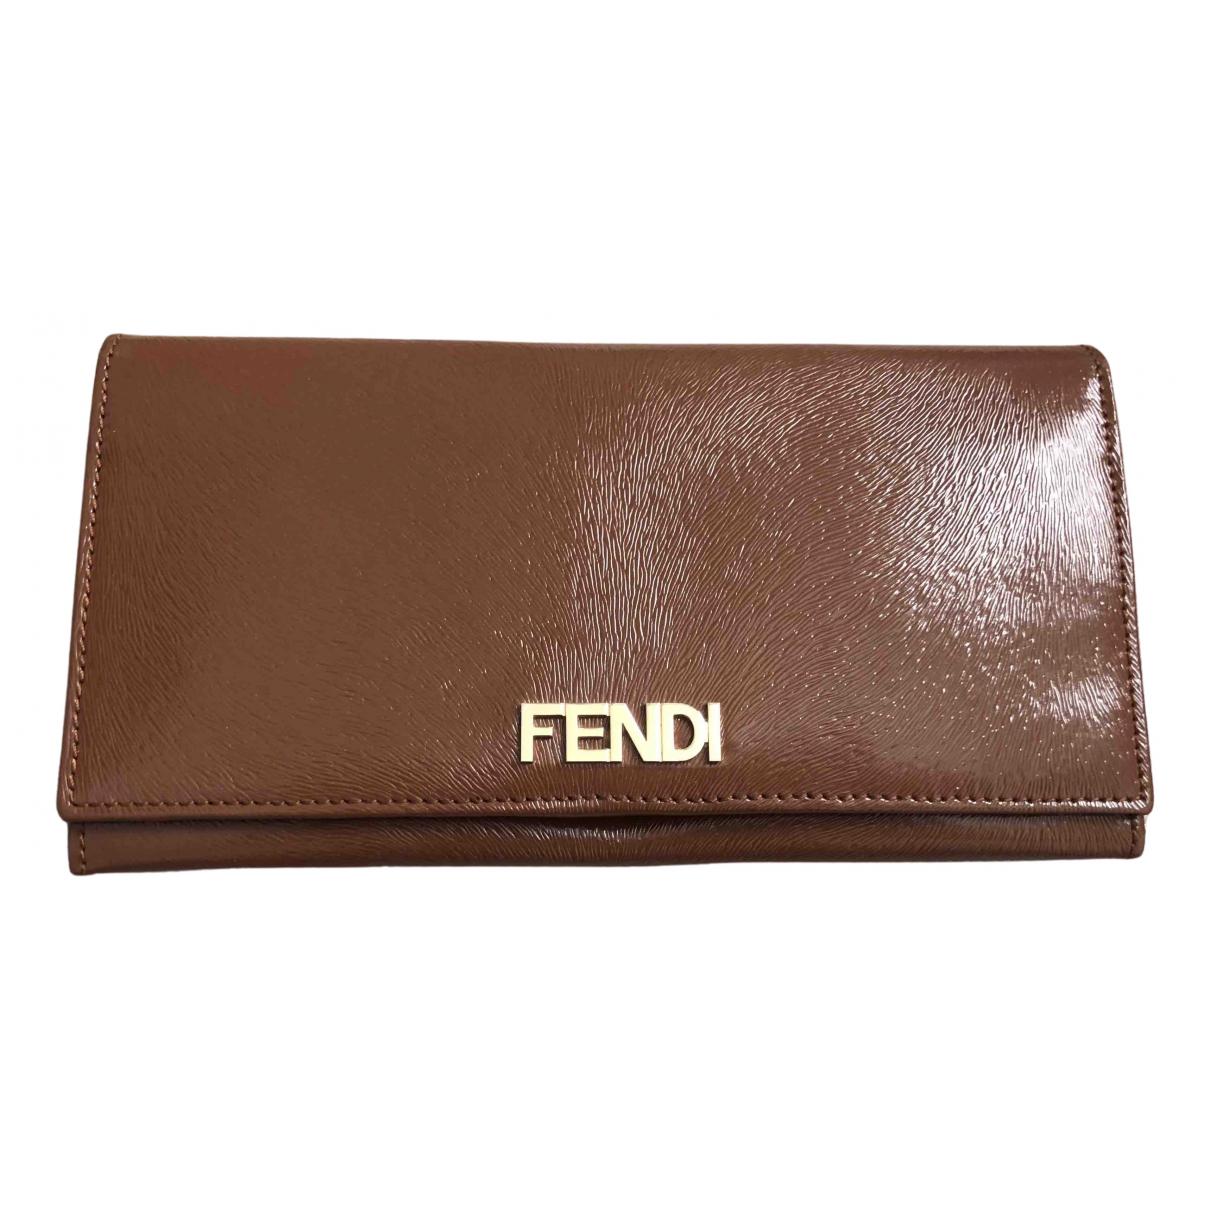 Fendi N Brown Patent leather wallet for Women N